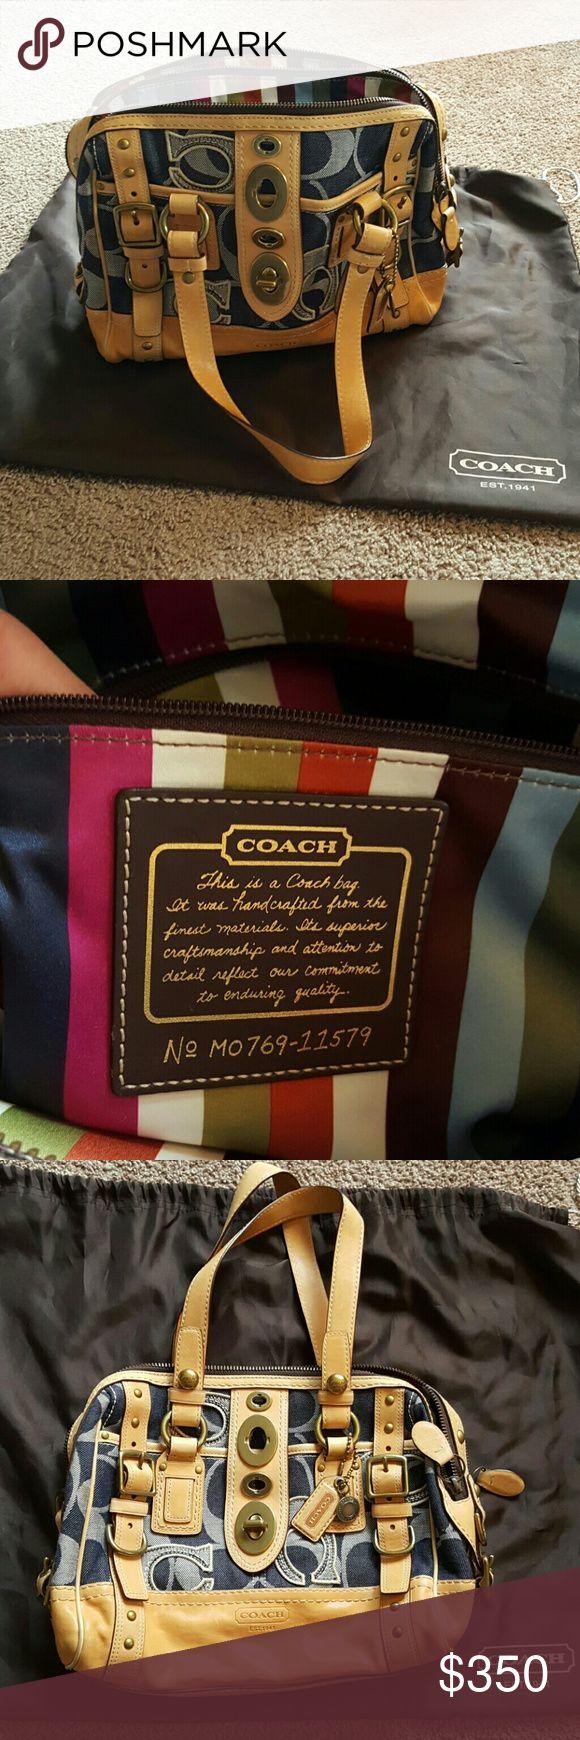 Coach legacy stripe signature denim lily satchel Authentic rare Coach vachetta legacy stripe signature denim lily satchel. In excellent condition. Coach Bags Satchels